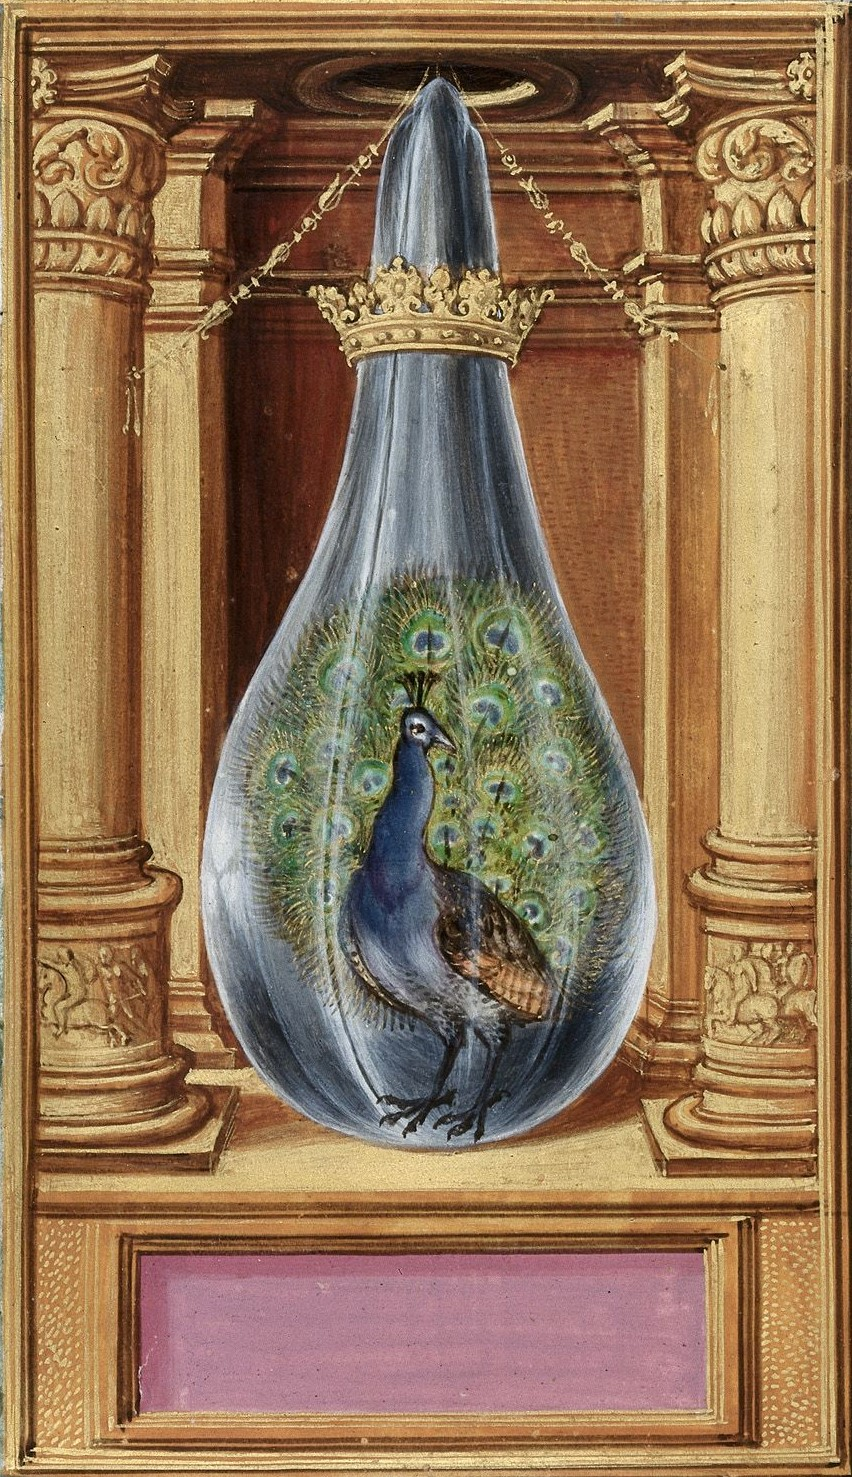 Peacock_from_BL_Harley_3469.jpg